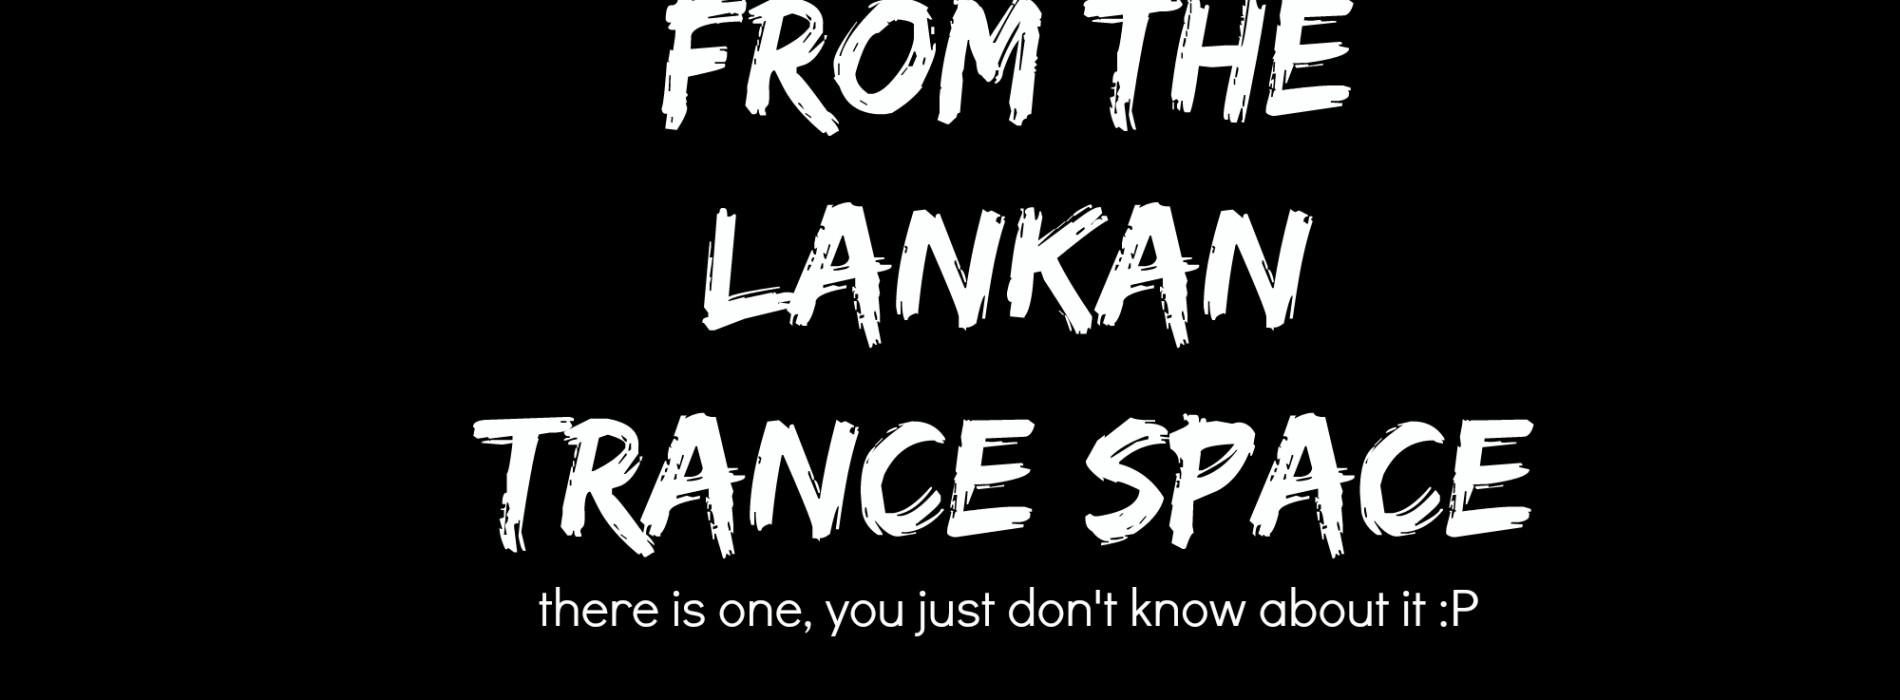 The Trance Space Of Sri Lanka